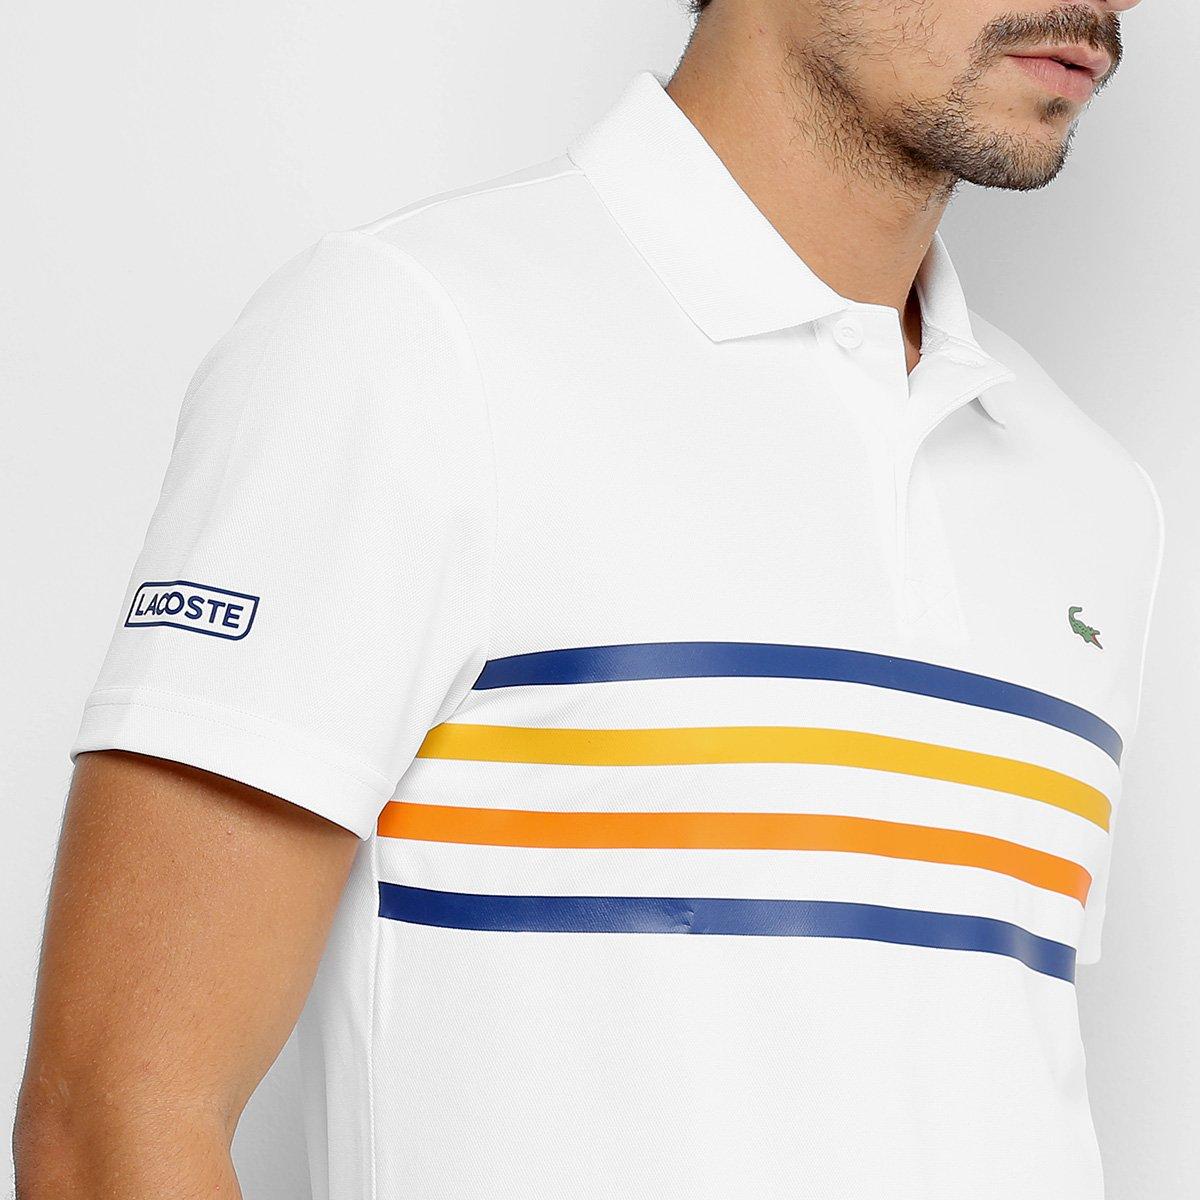 Camisa Polo Lacoste Sport Tennis Masculina - Branco - Compre Agora ... 7cb6d4c337